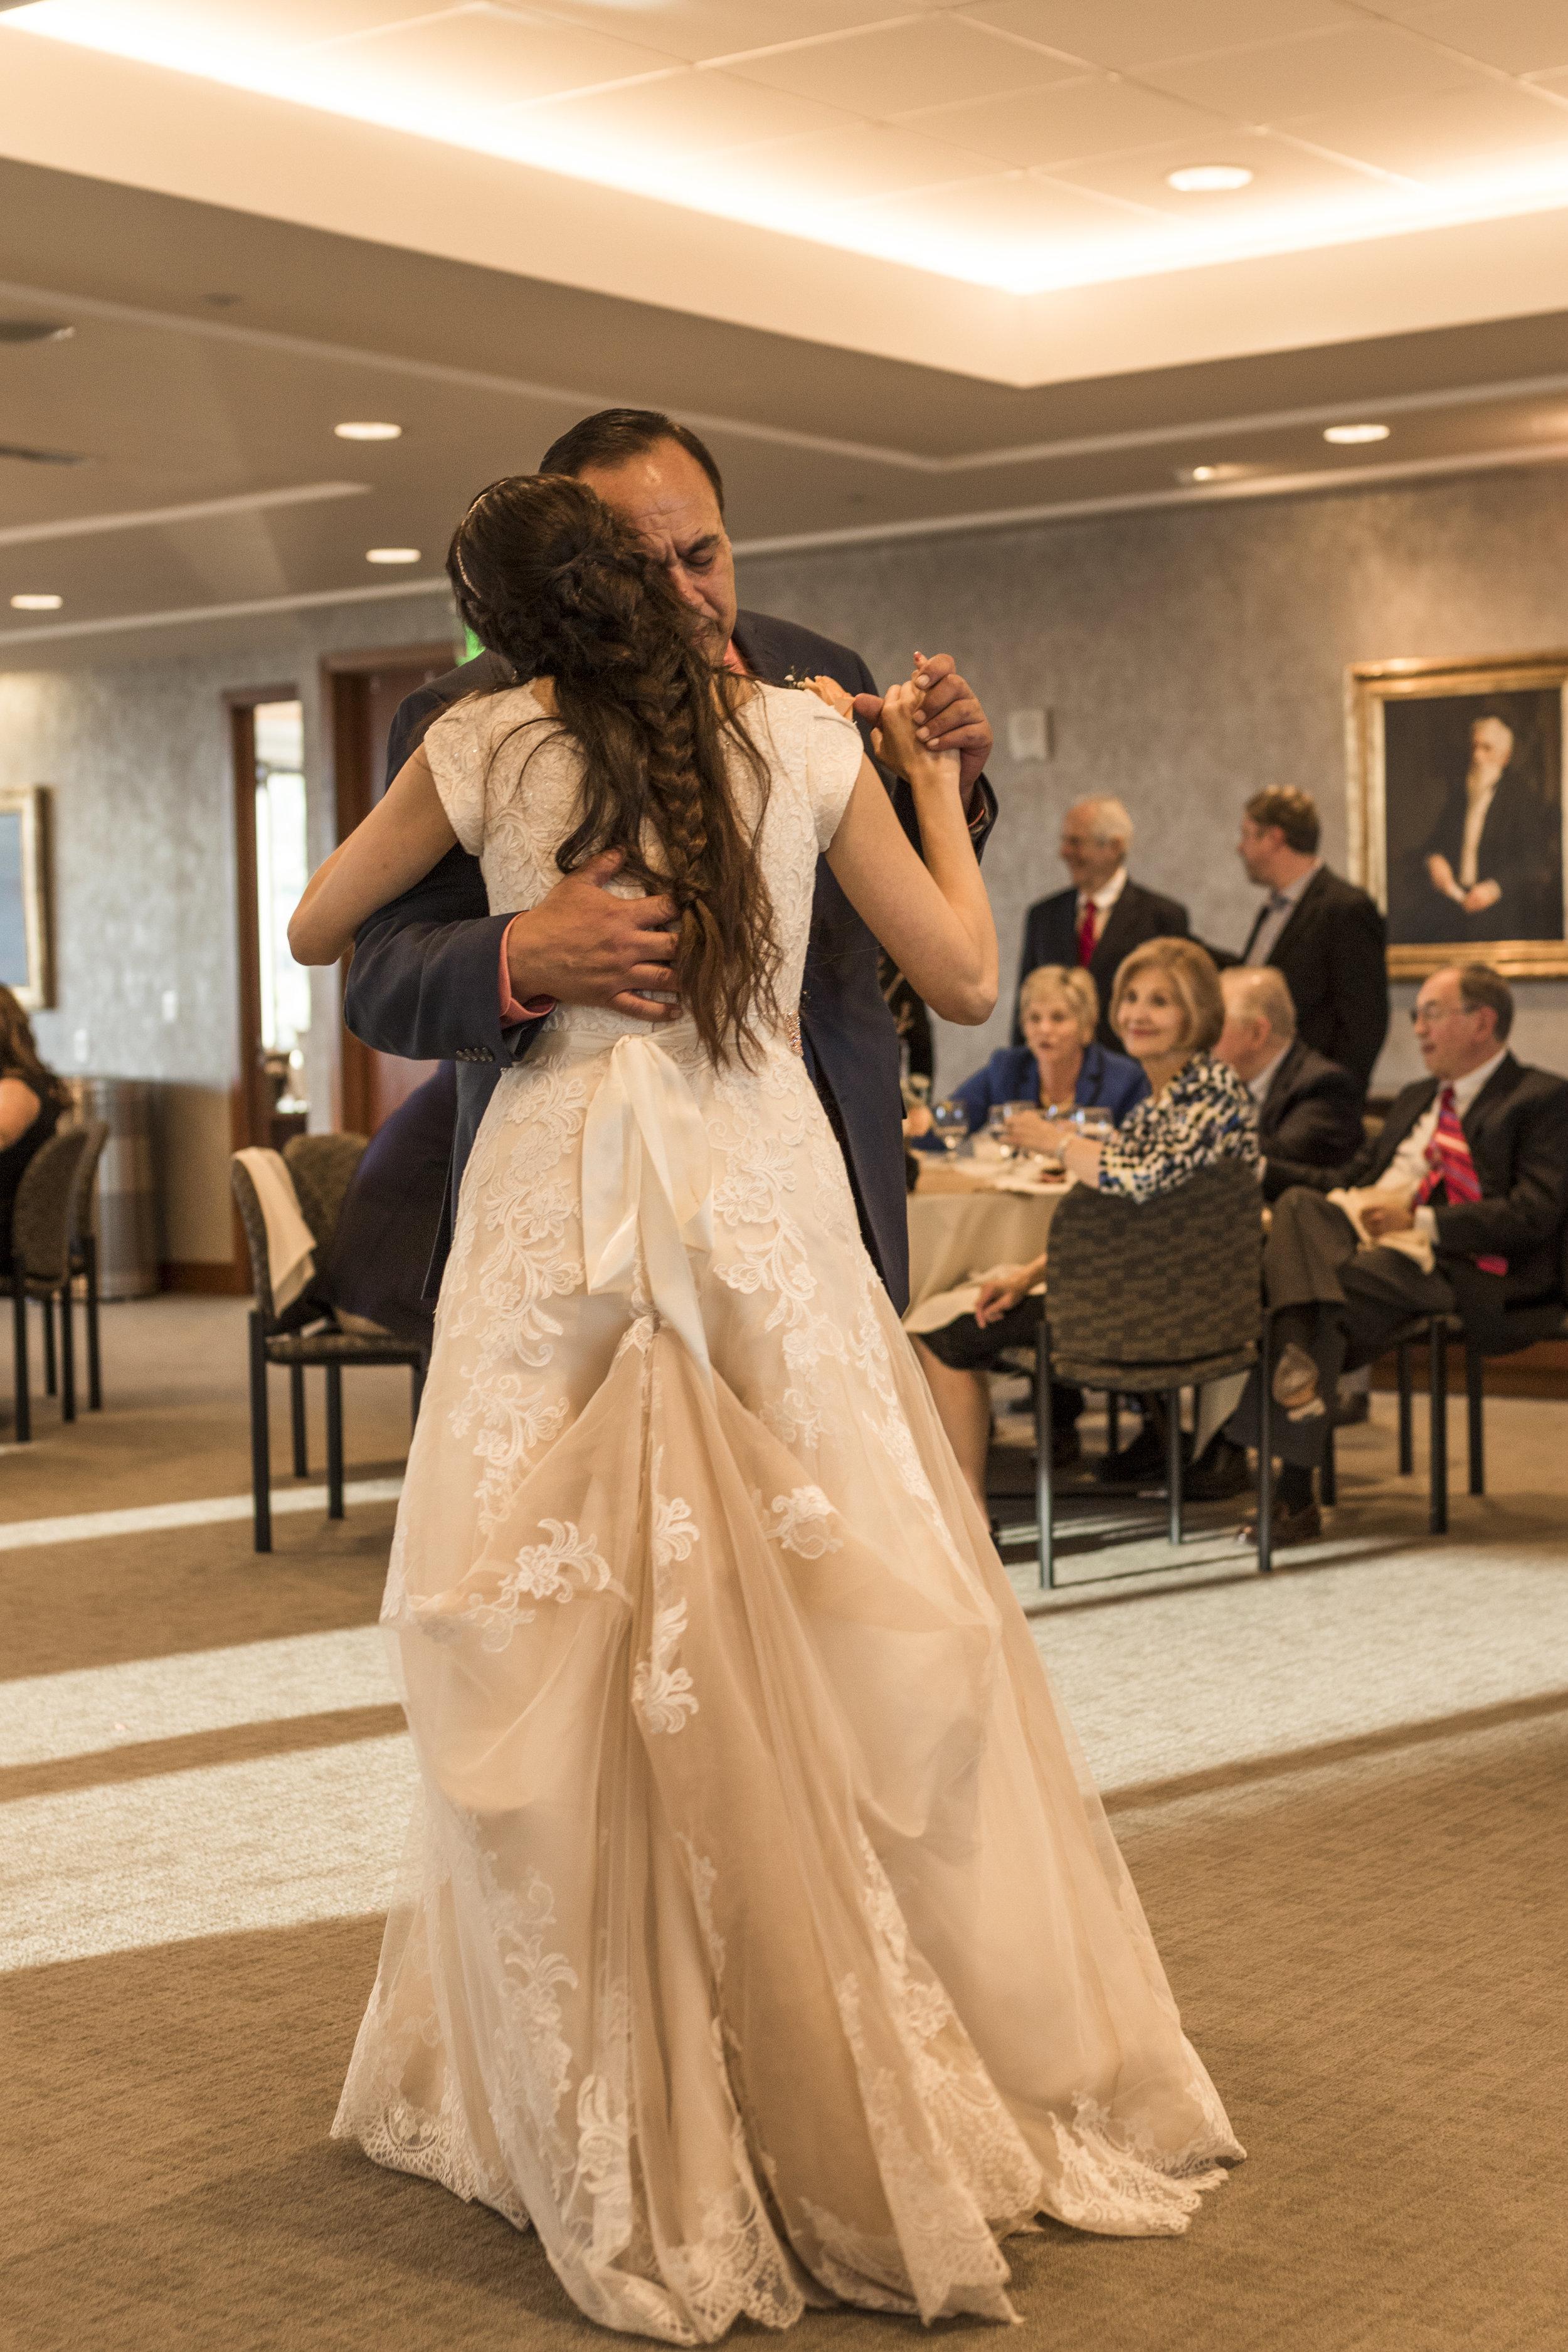 Utah Spring Wedding Reception in the Zions Bank Founders Room by Bri Bergman Photography12.JPG